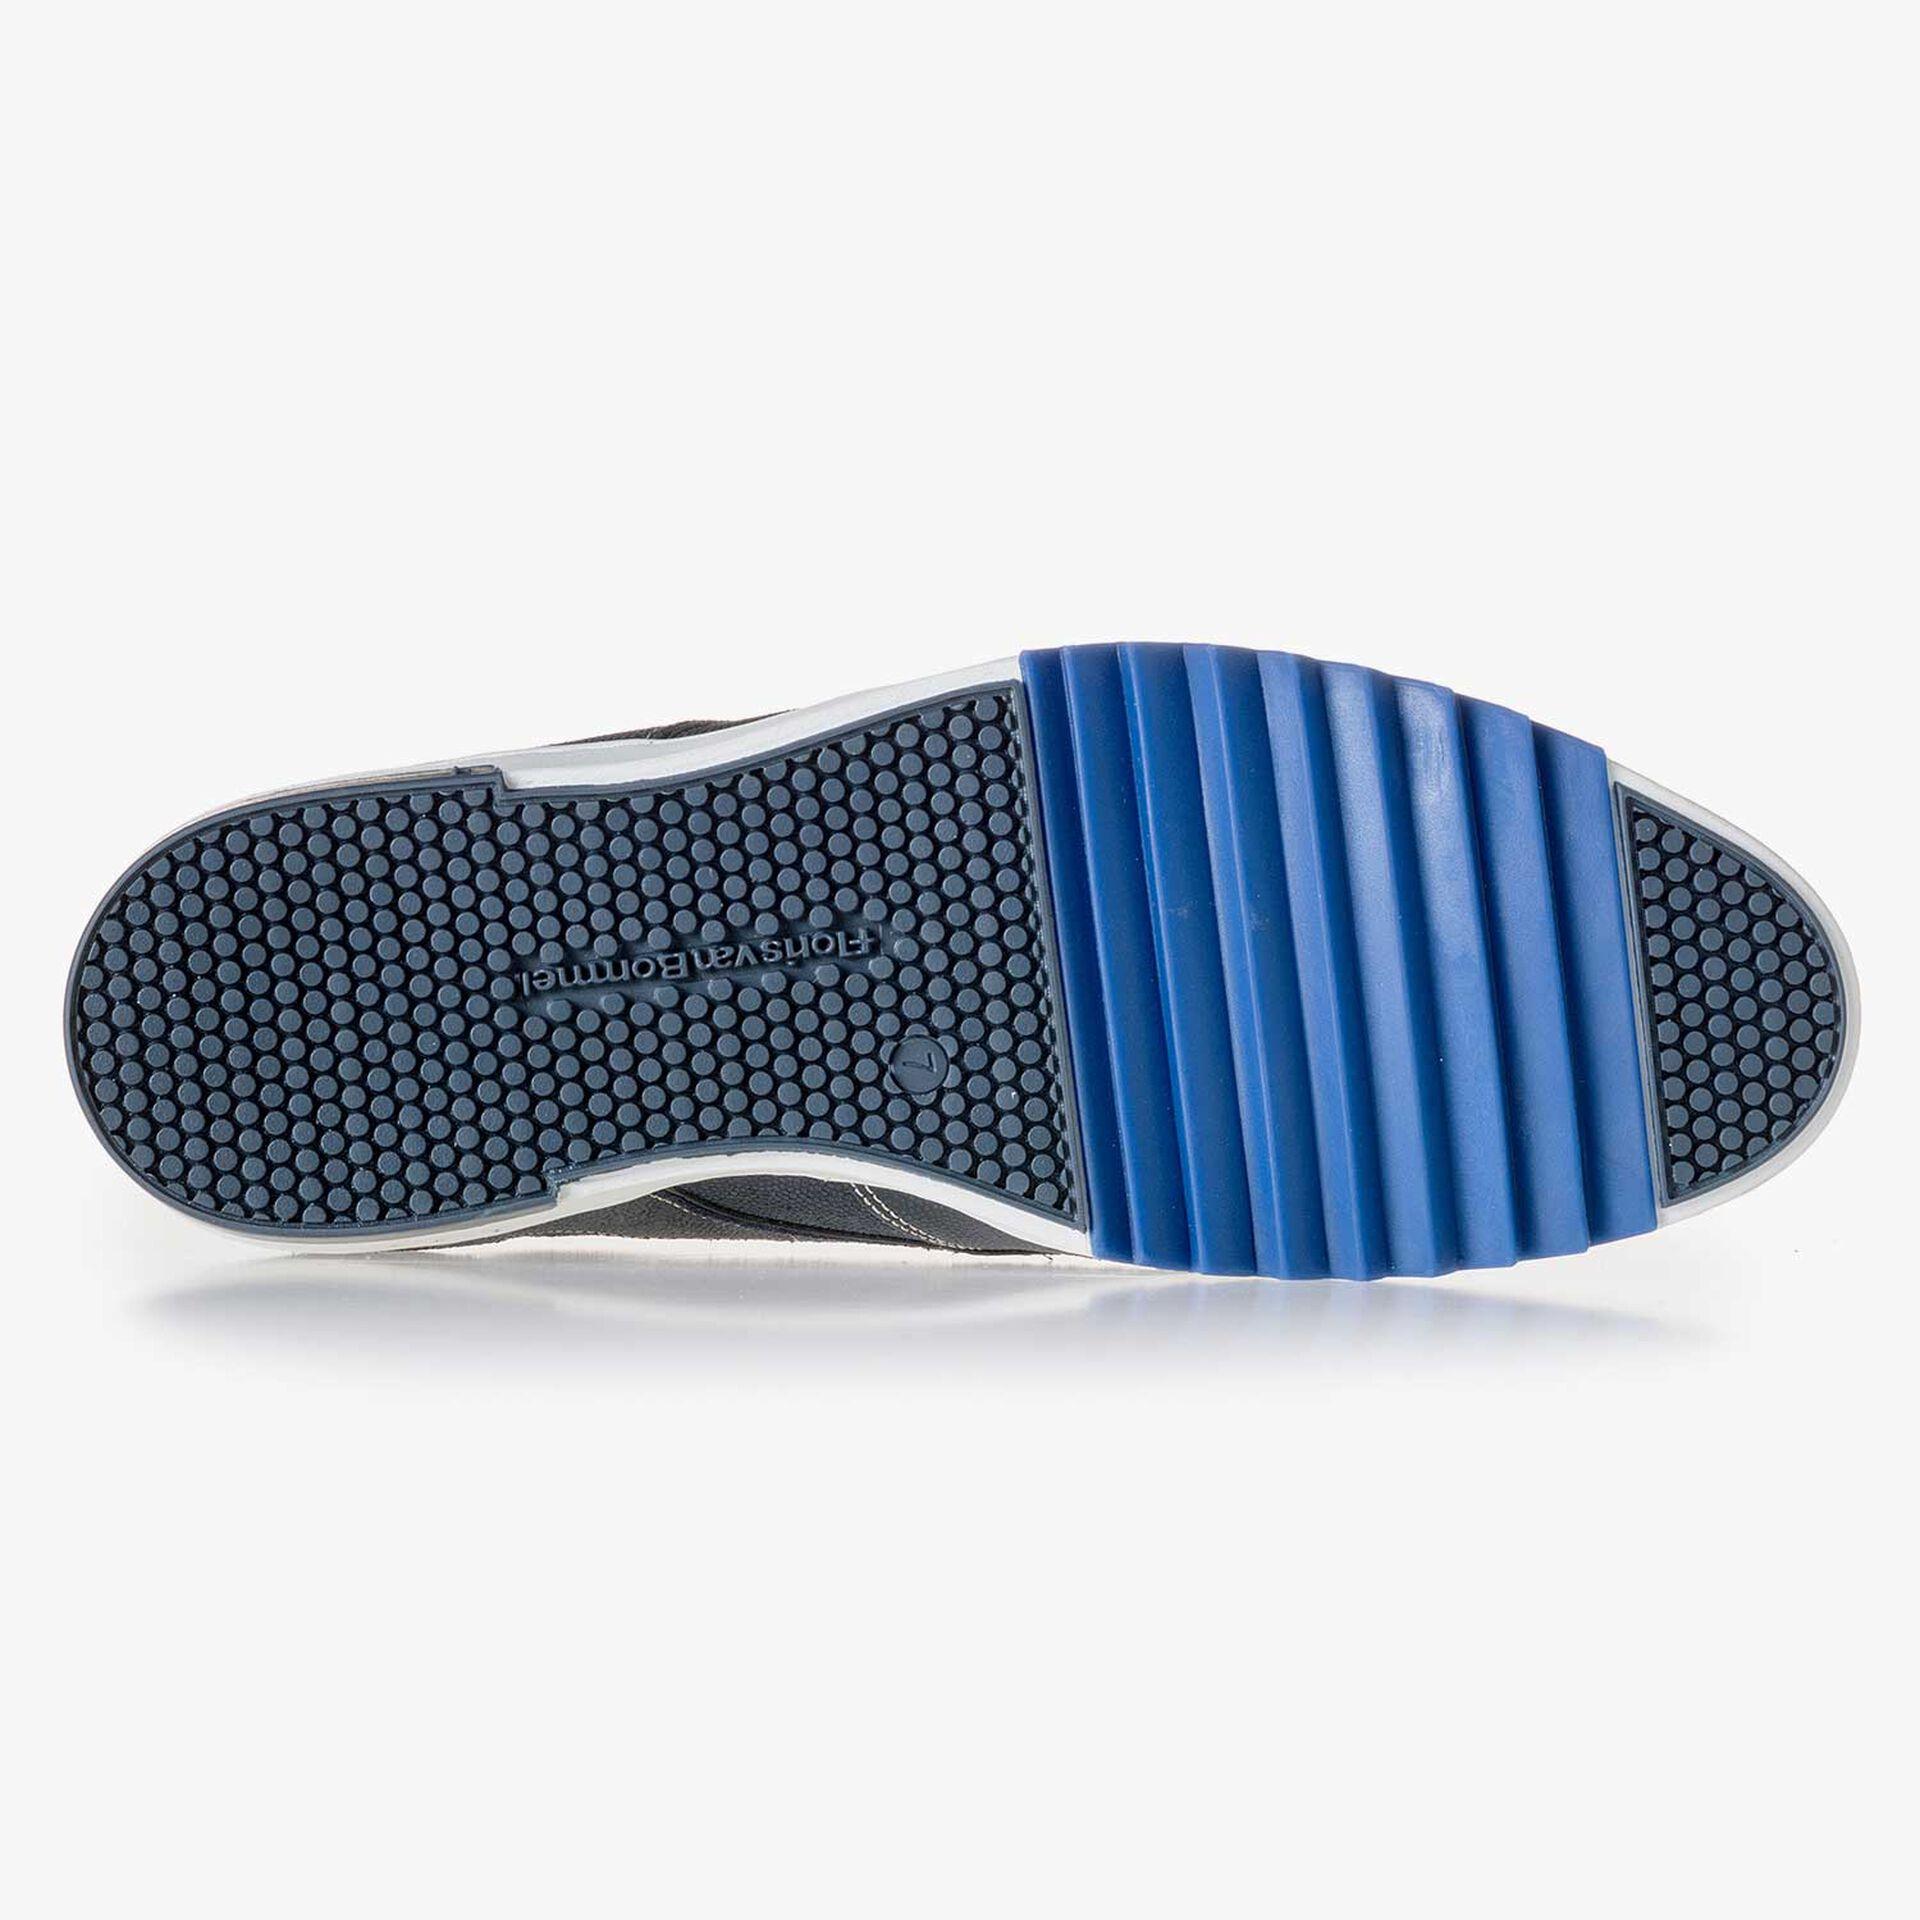 Dark blue patterned suede leather sneaker